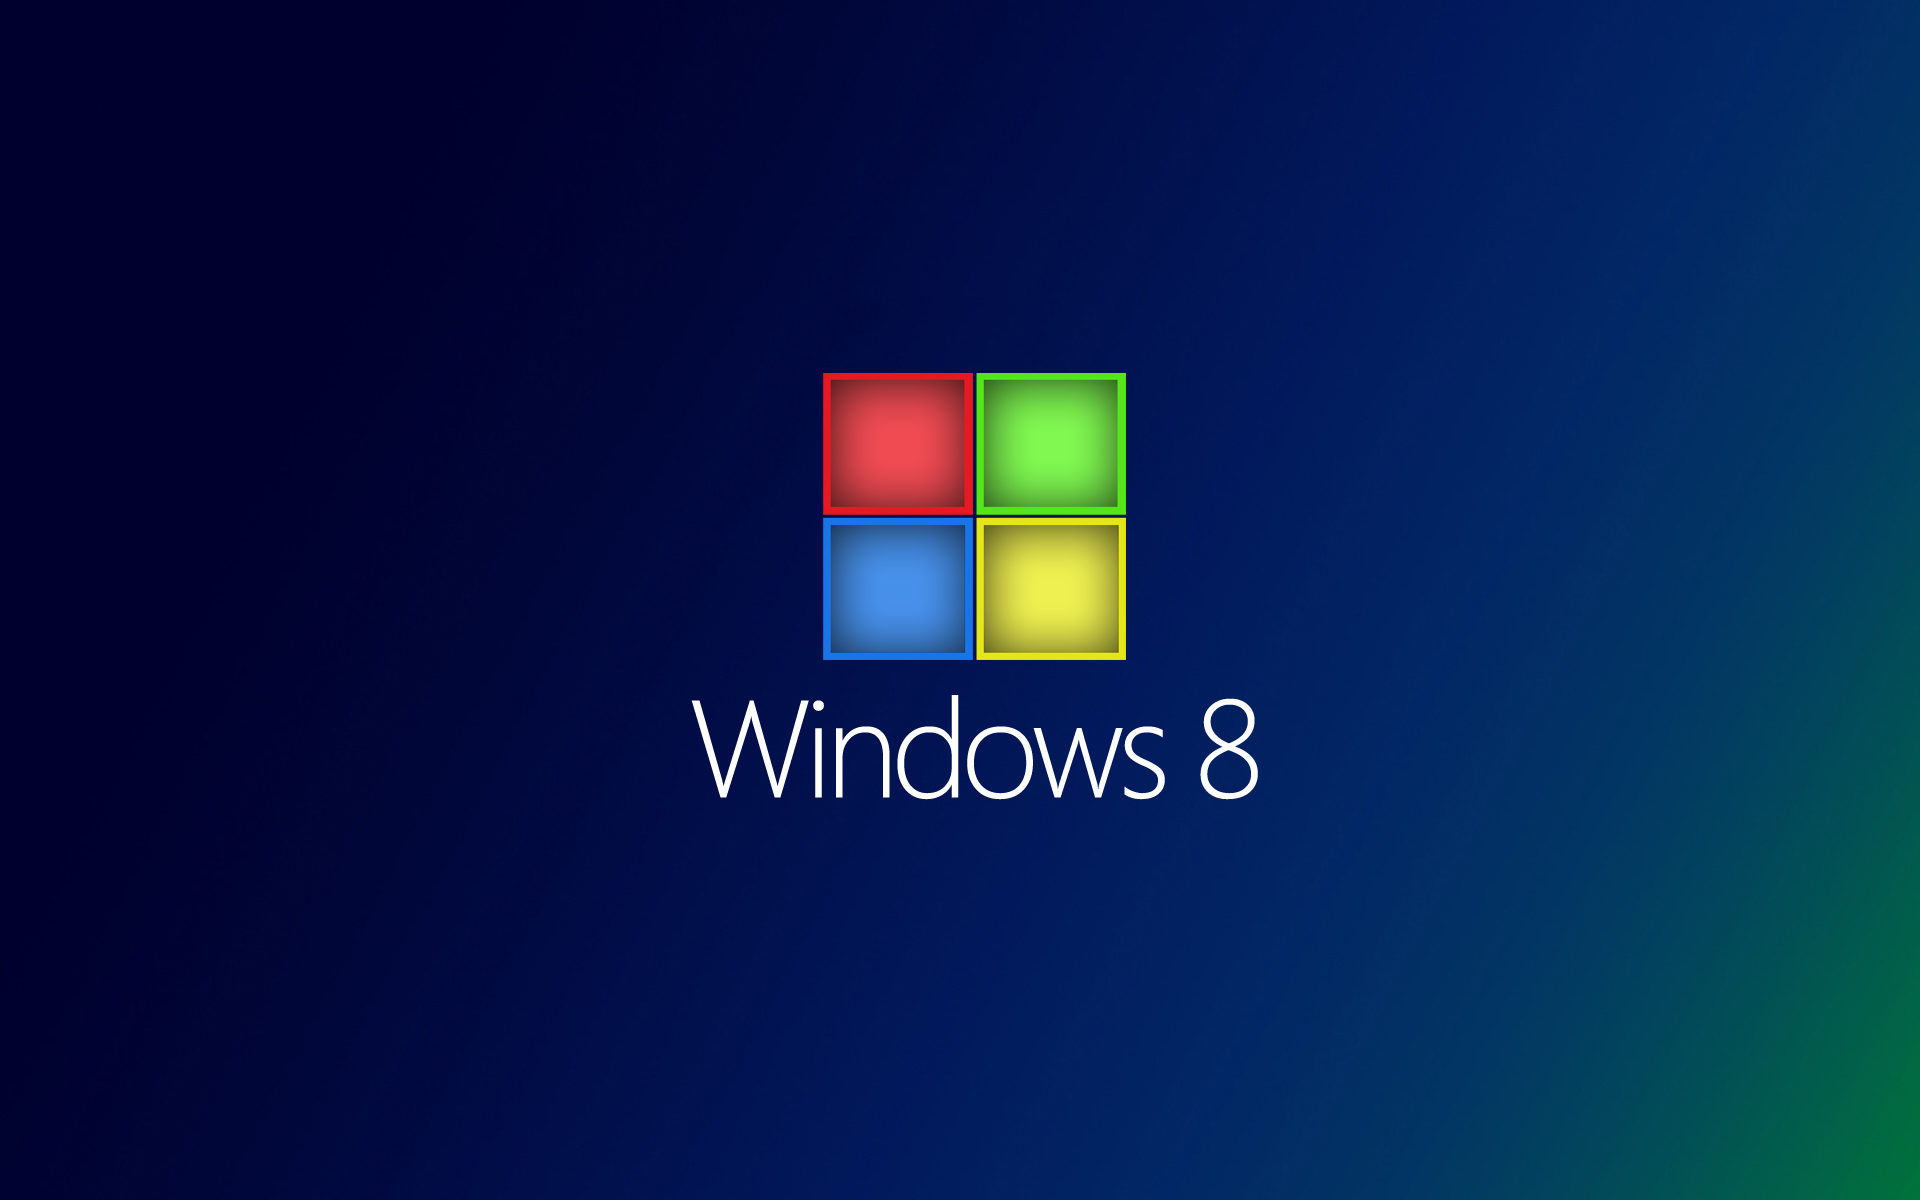 Windows 8 Wallpaper HD 48612